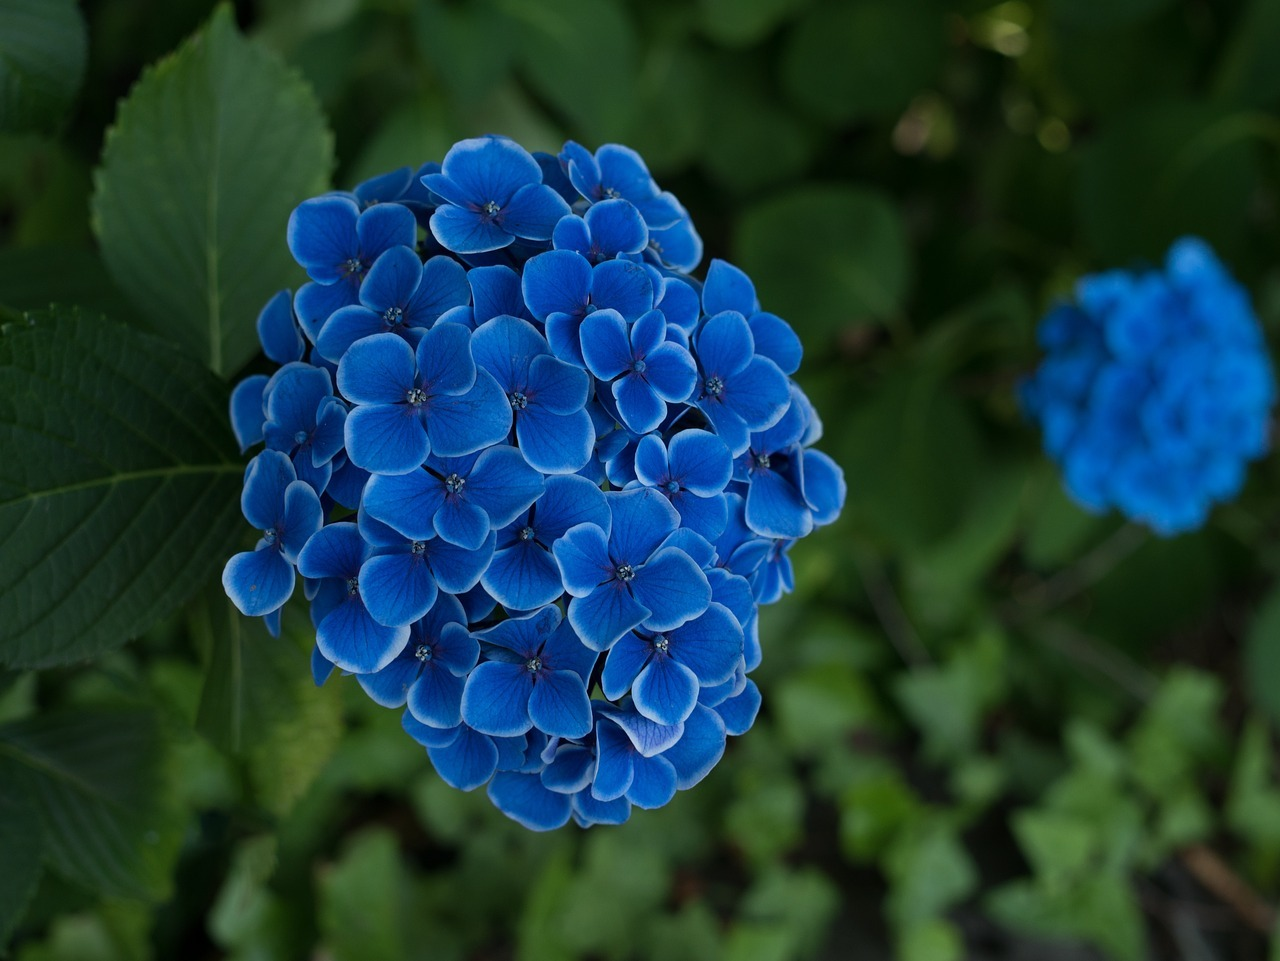 hydrangea-2425728_1280[1]